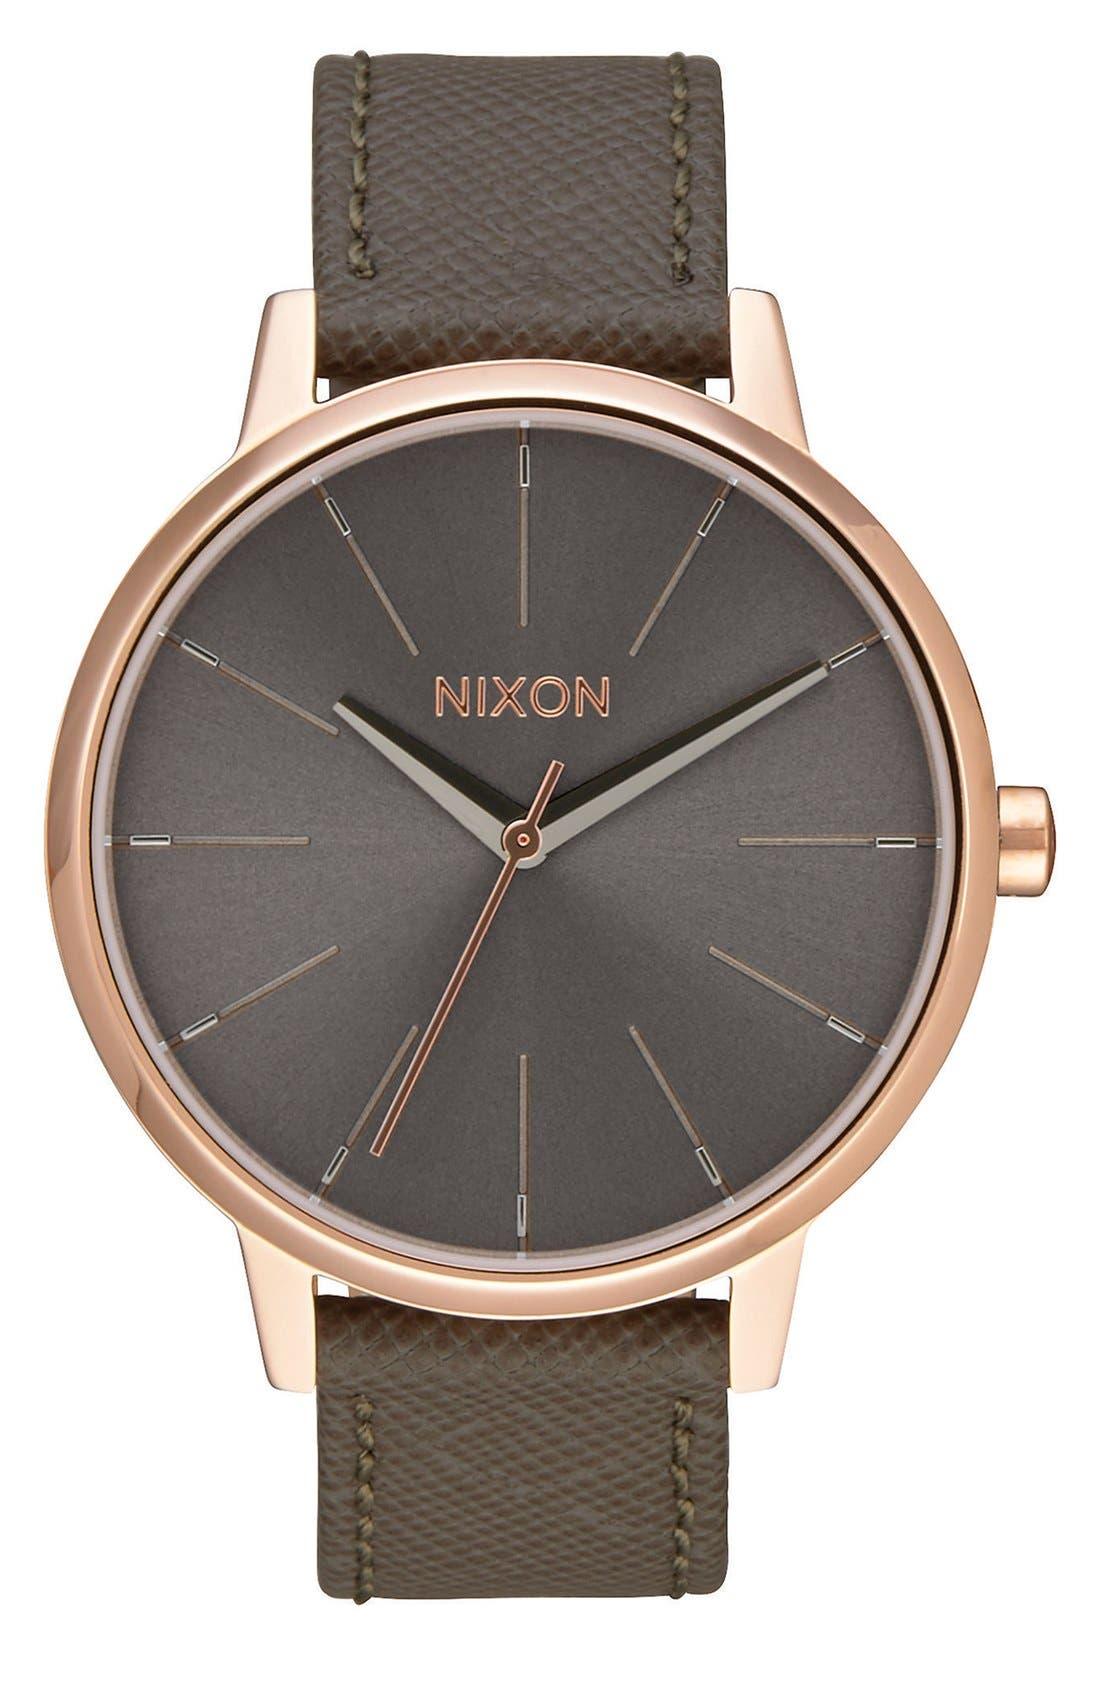 Nixon 'Kensington' Leather Strap Watch, 37mm